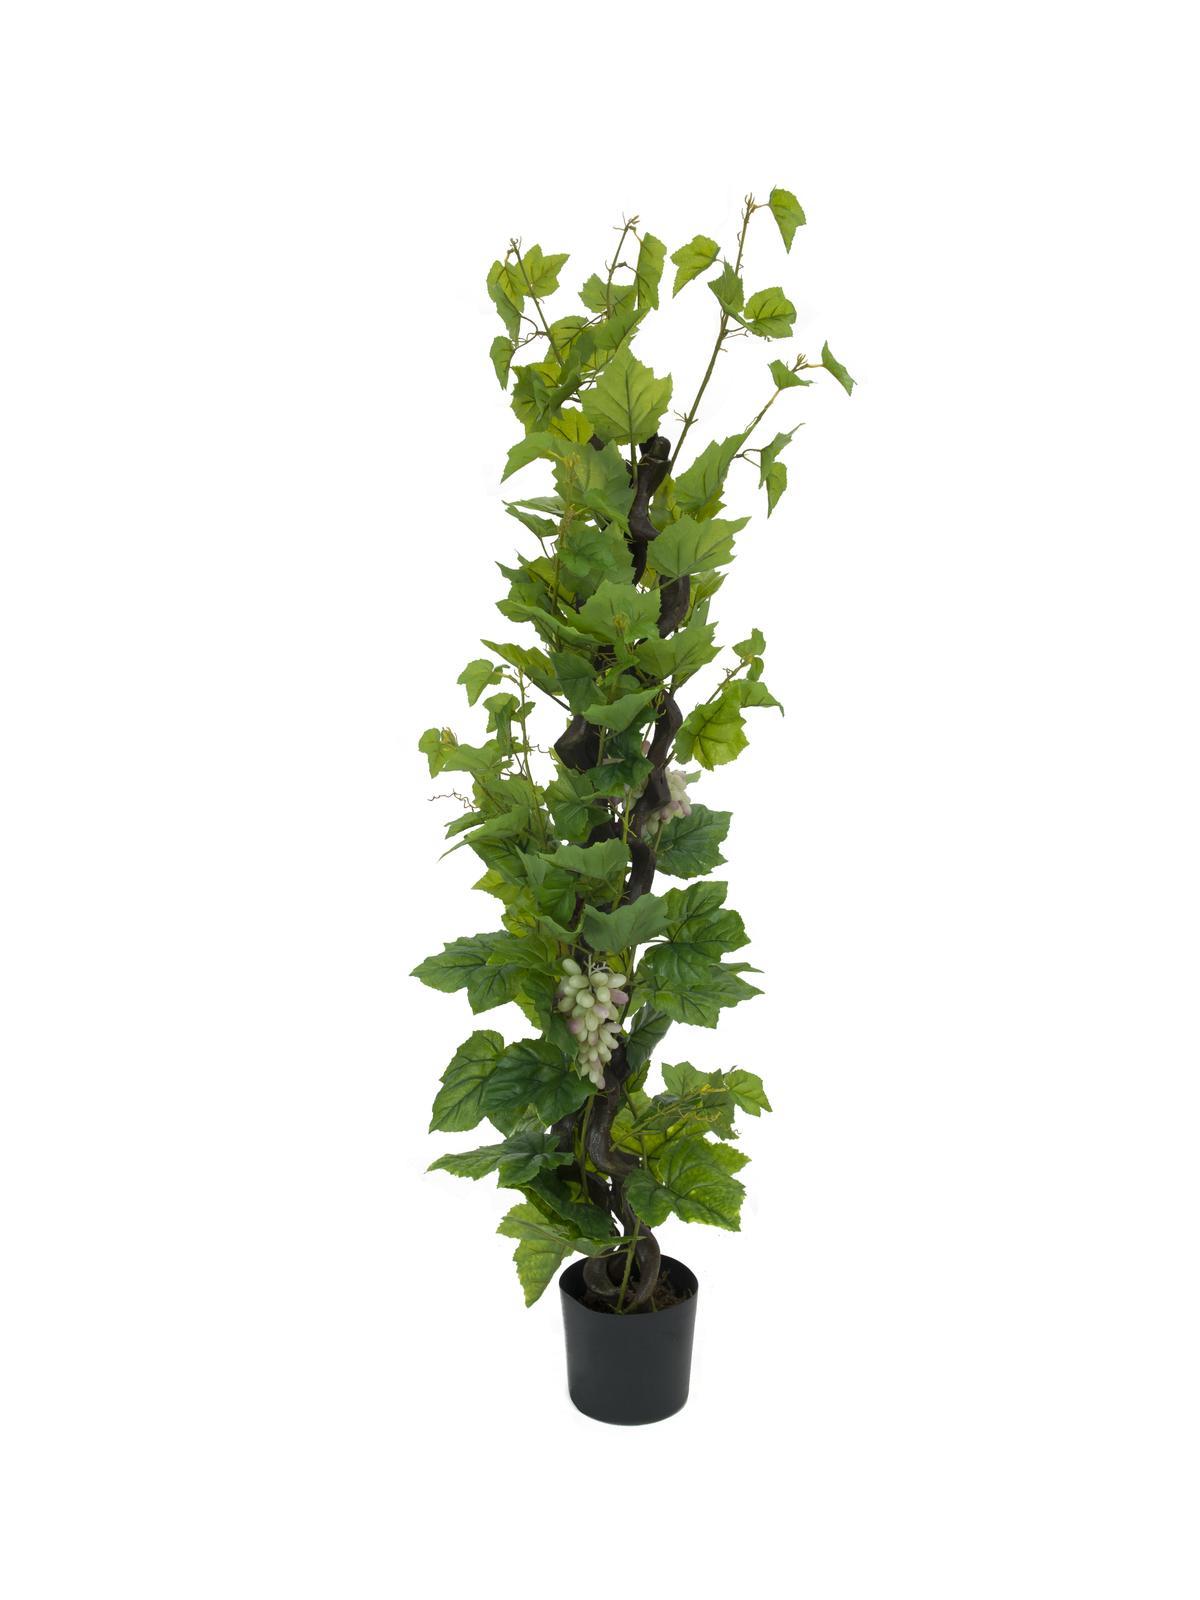 EUROPALMS Vite con uva, 160cm